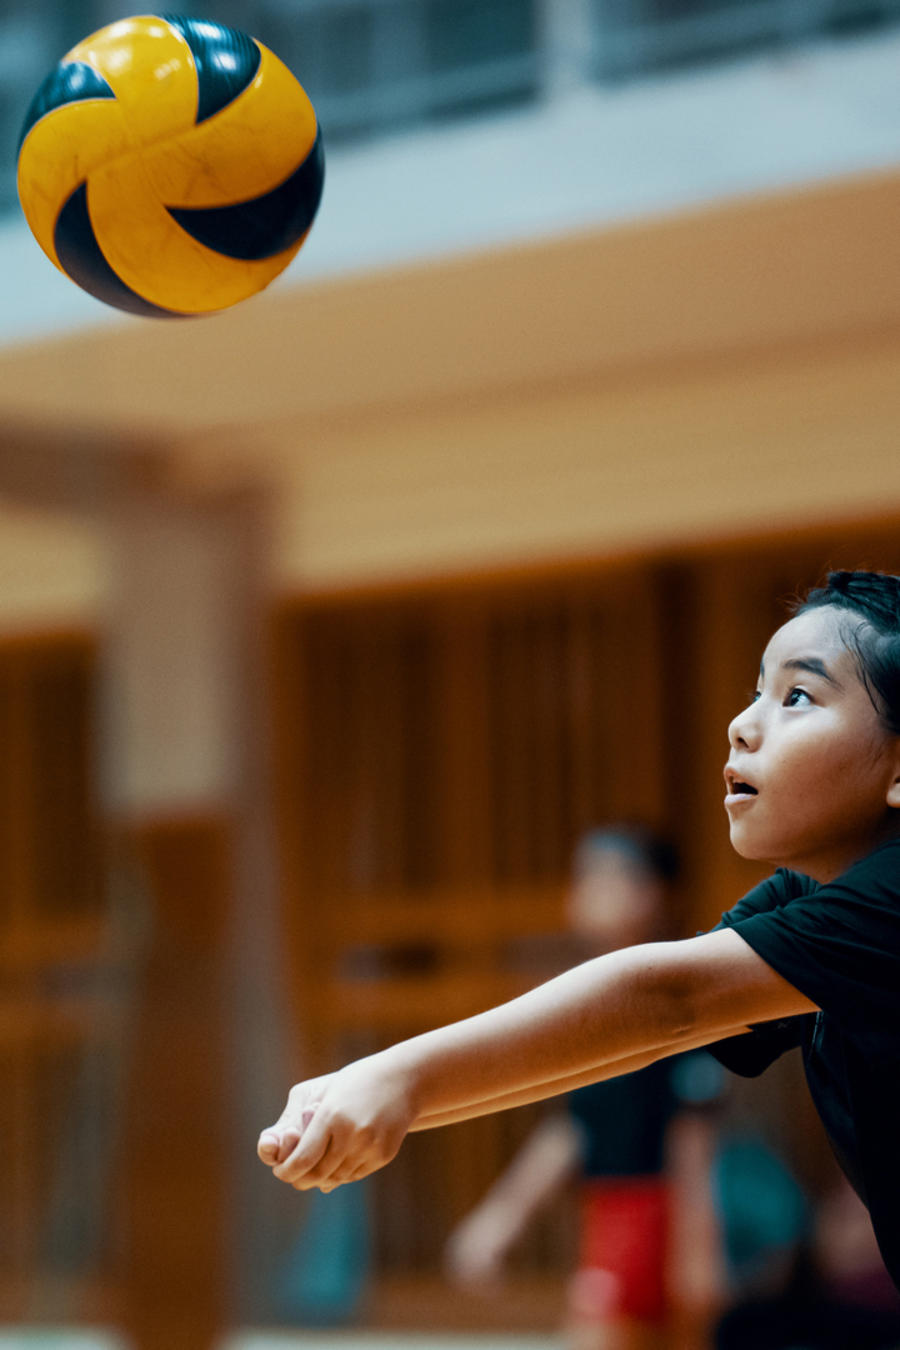 Jugar voleibol